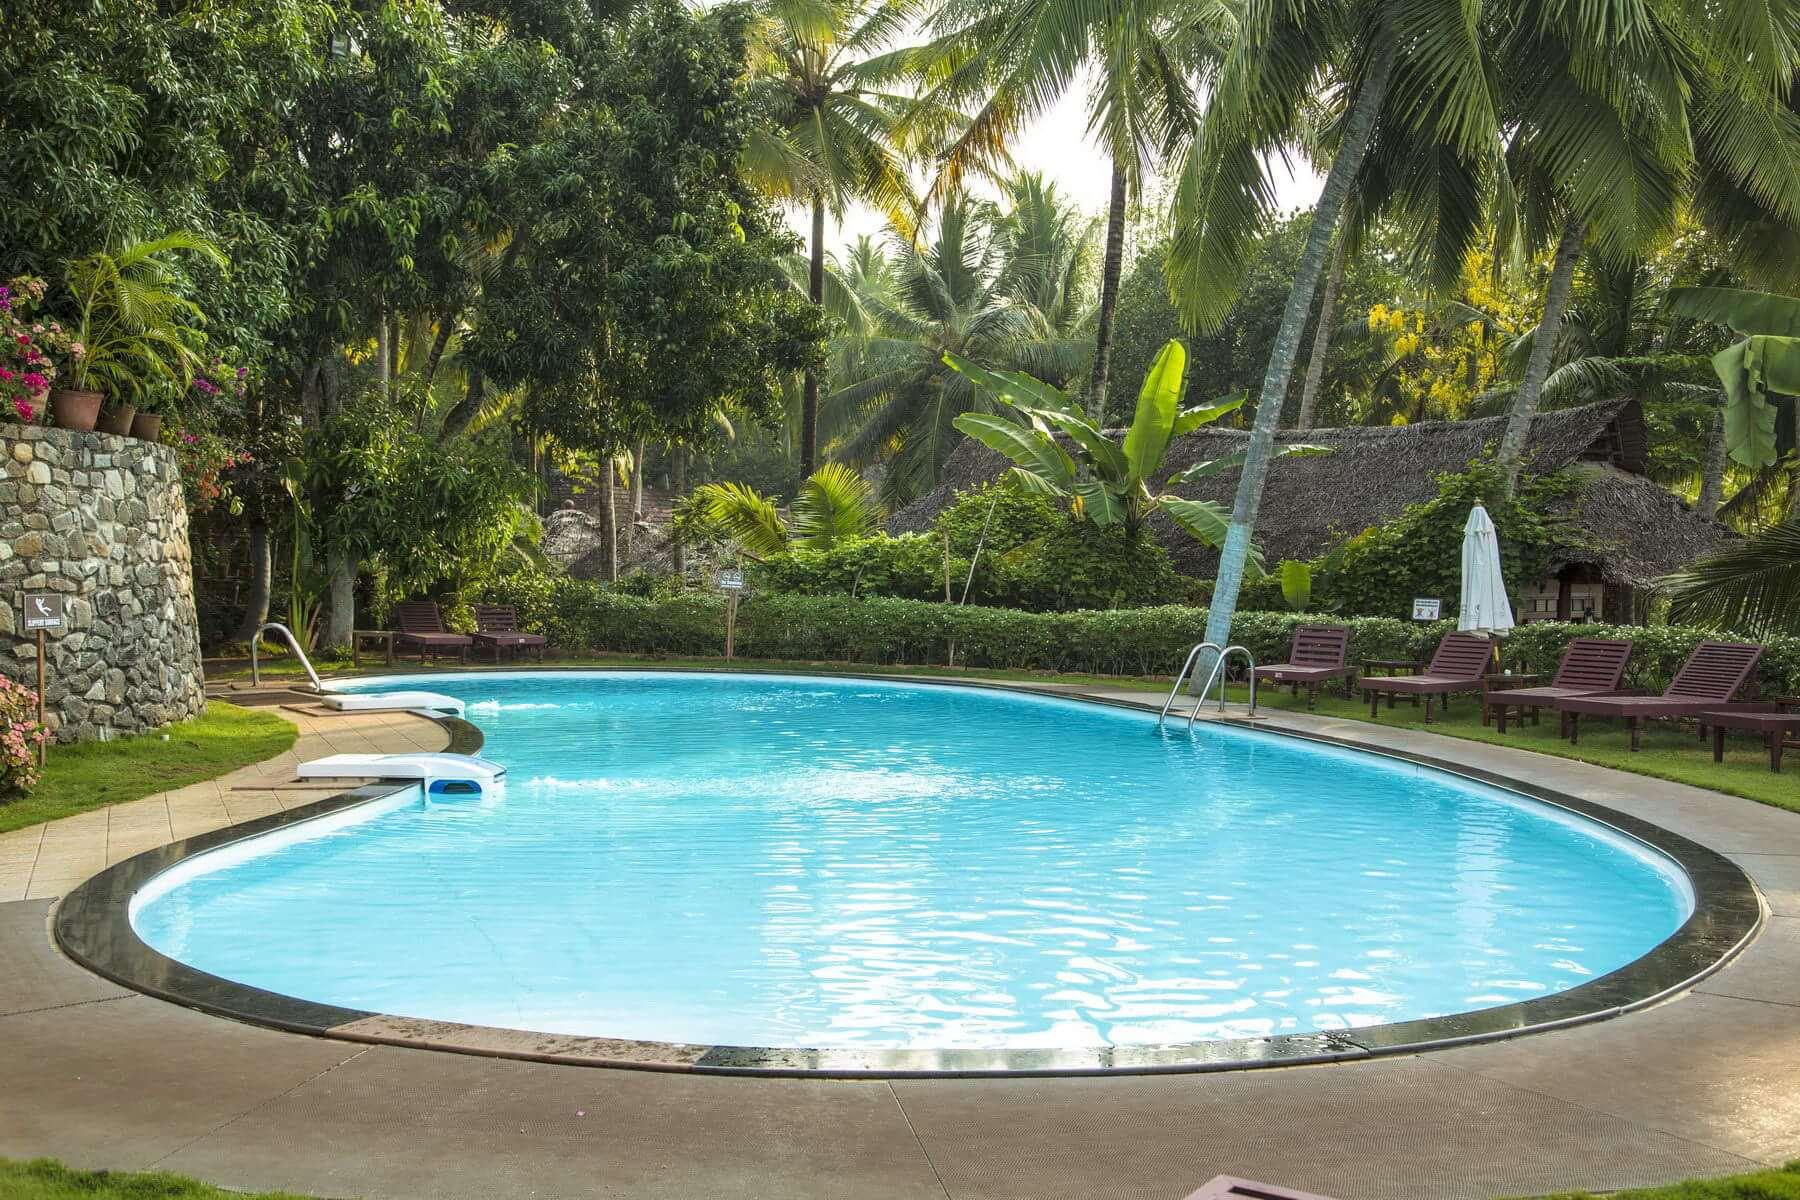 Das Somatheeram Ayurvedic Health Resort bietet einen Swimmingpool mit direktem Zugang zum Meer.